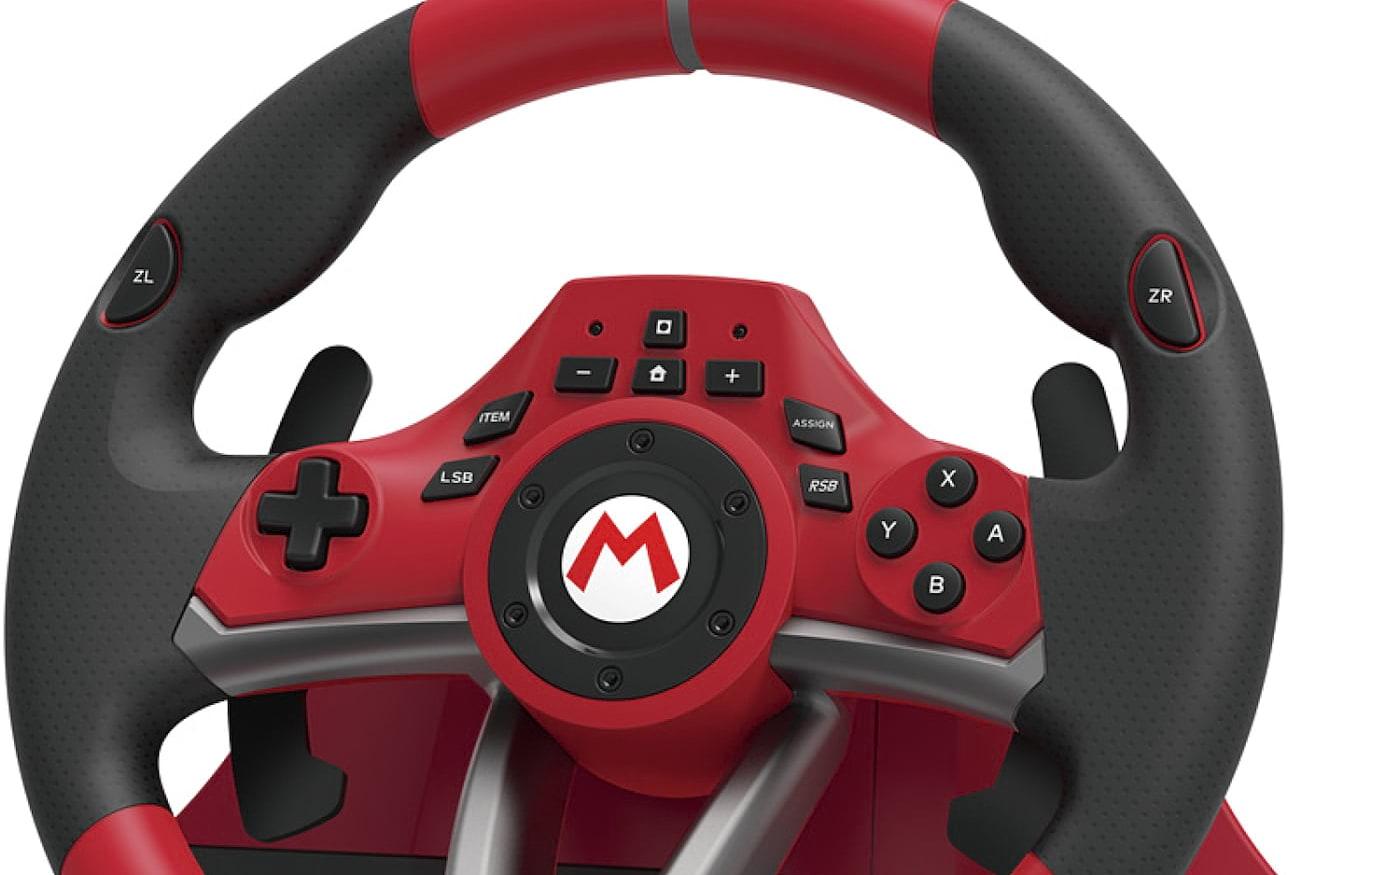 Japonesa Hori anuncia volante oficial de Mario Kart para Nintendo Switch